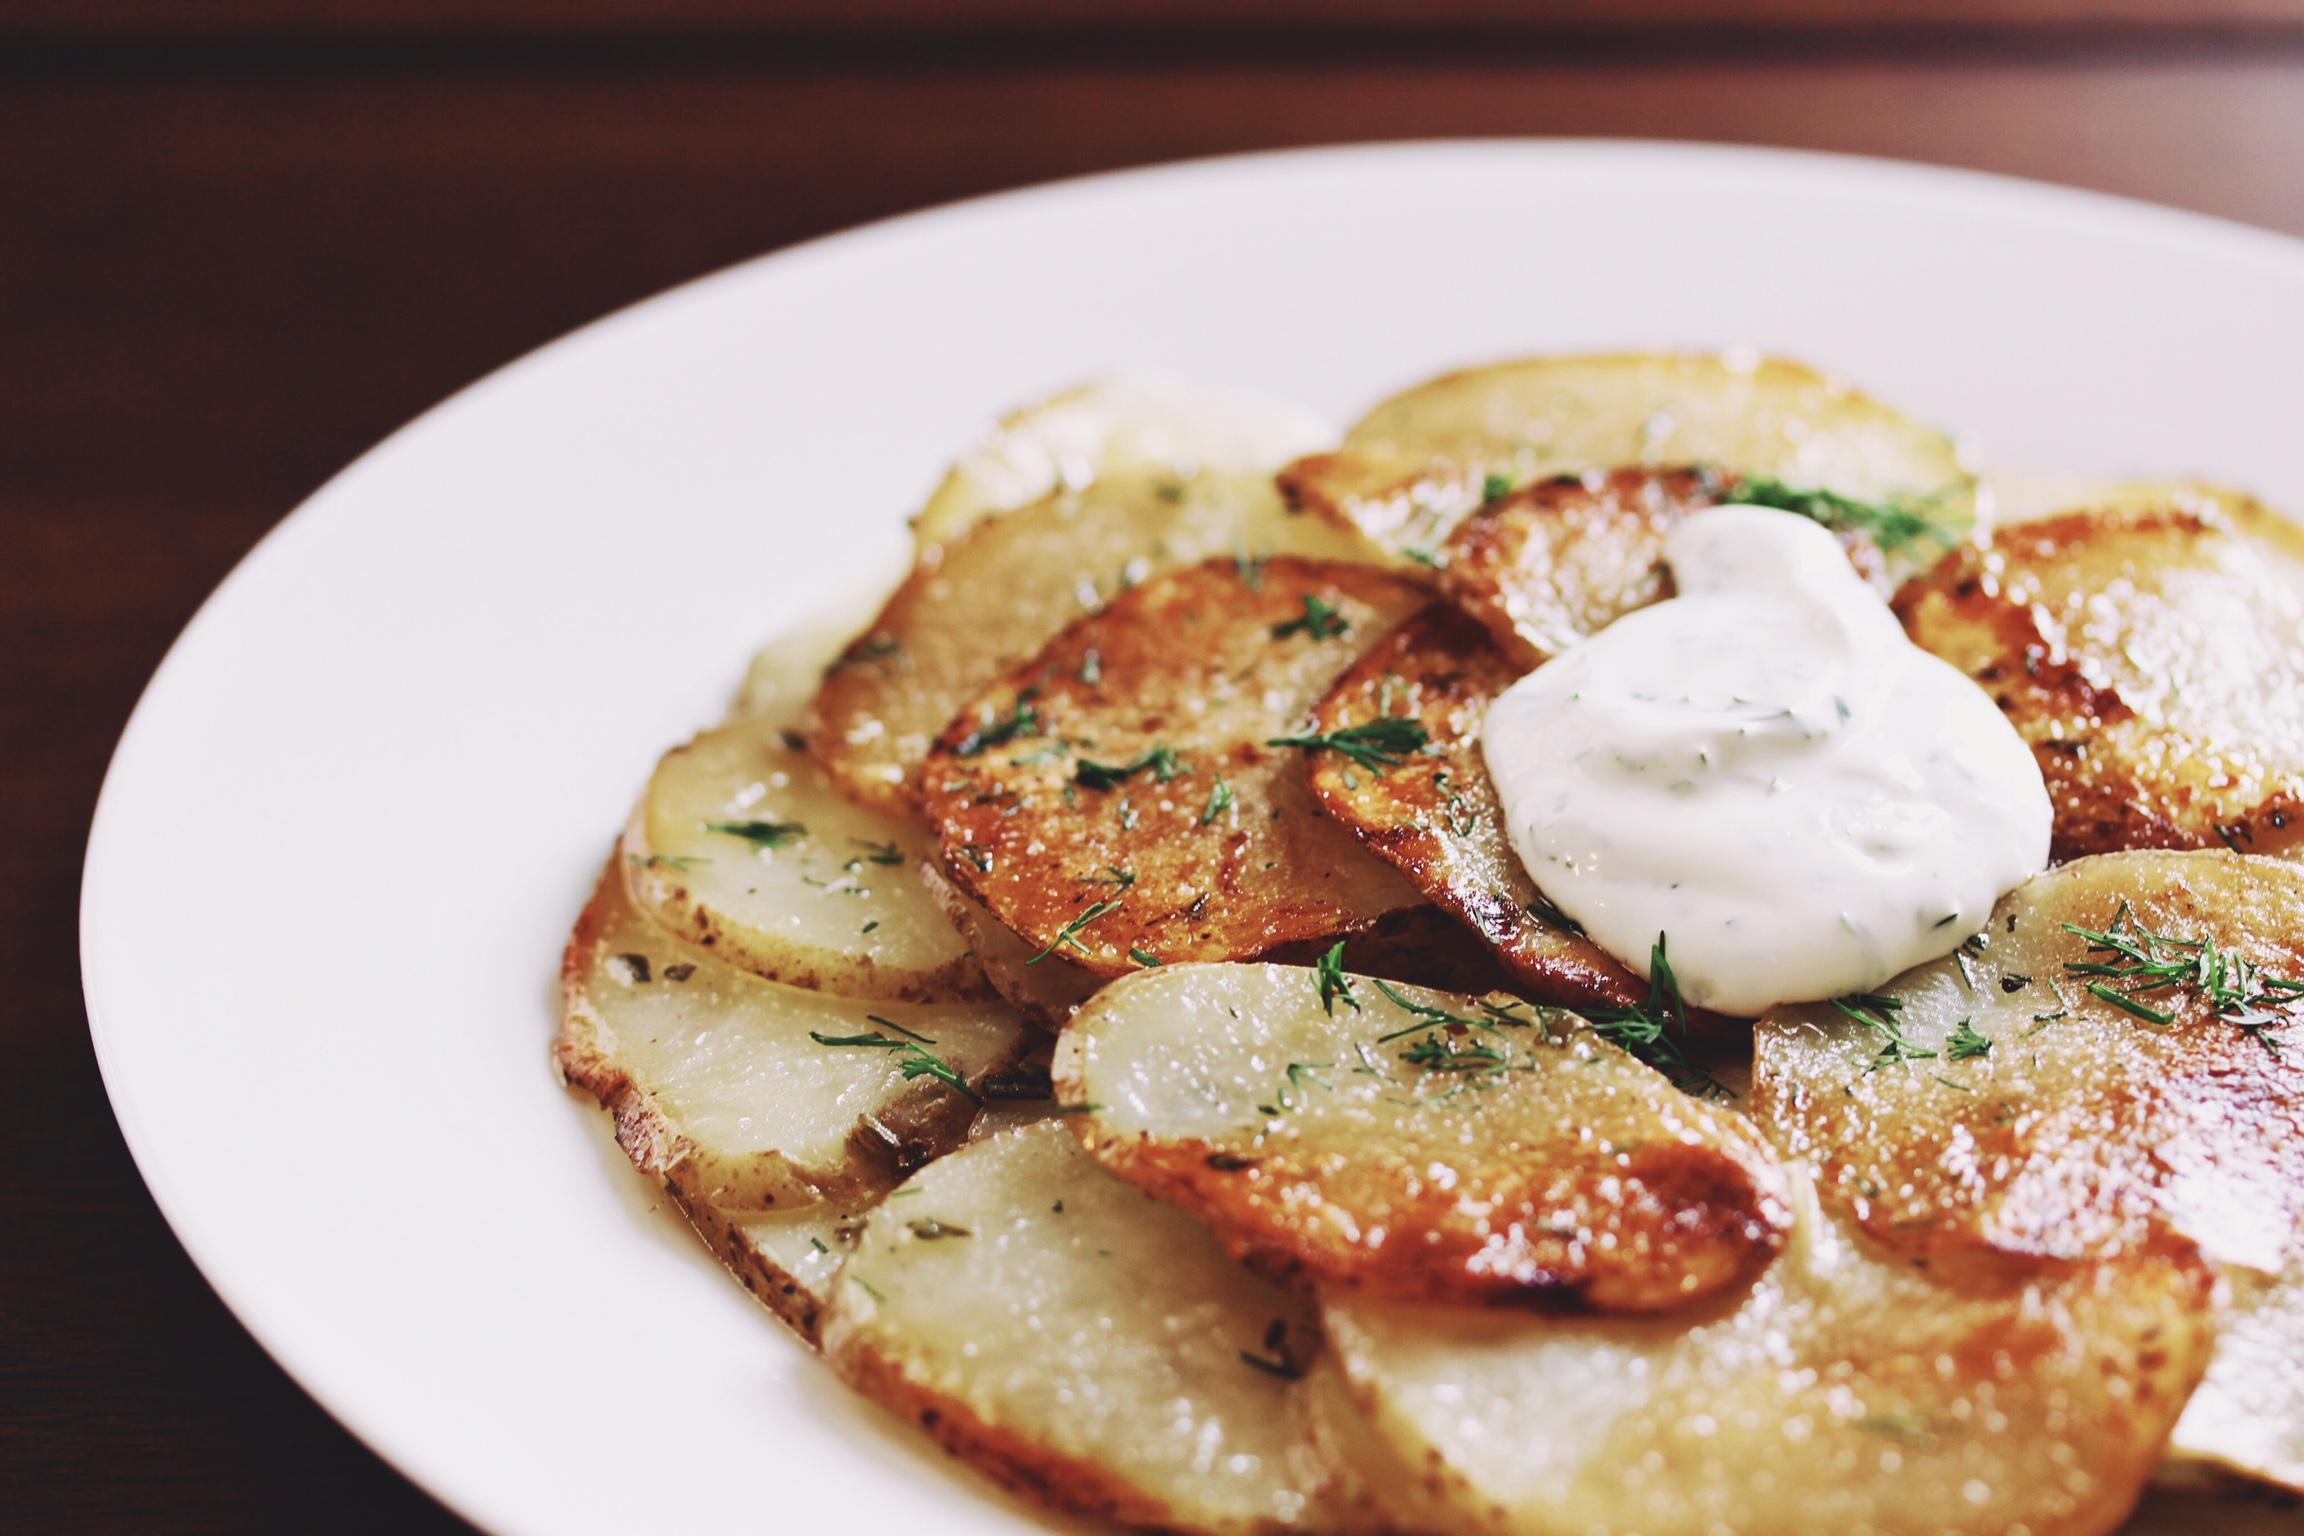 Rosemary potato galette for brunch - The Pastiche